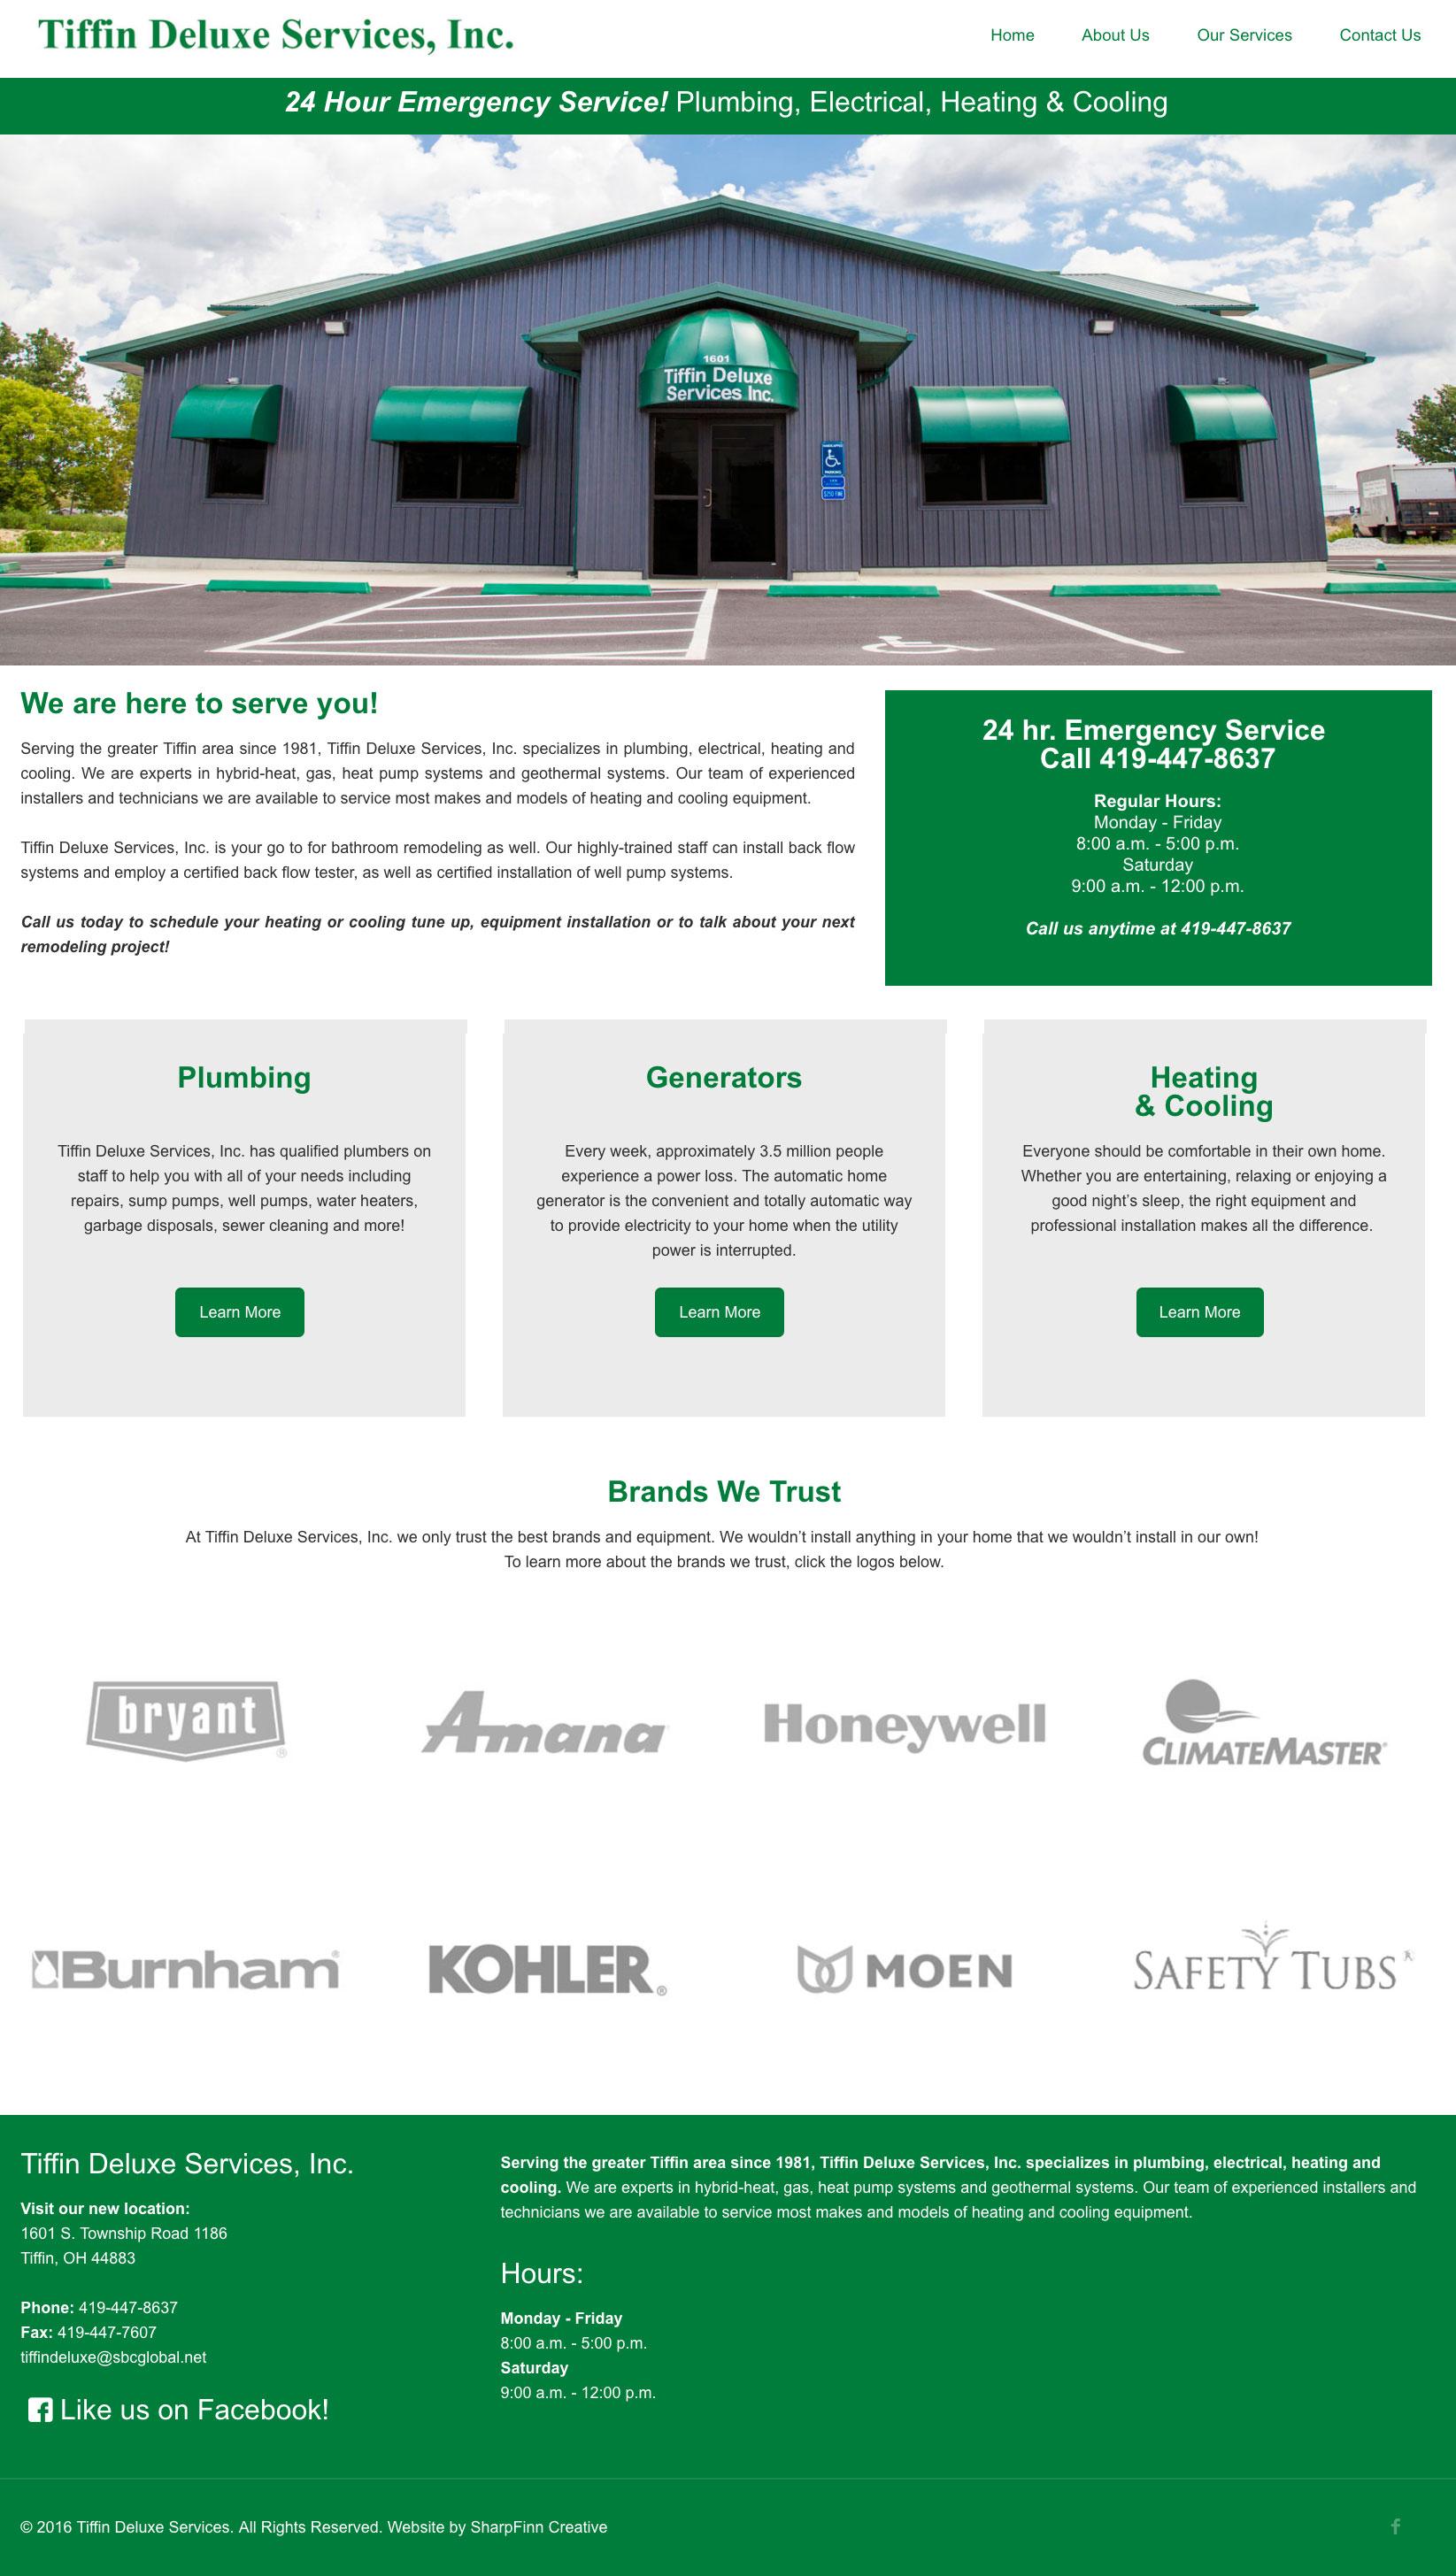 Tiffin Deluxe Services, Inc. | Website Design